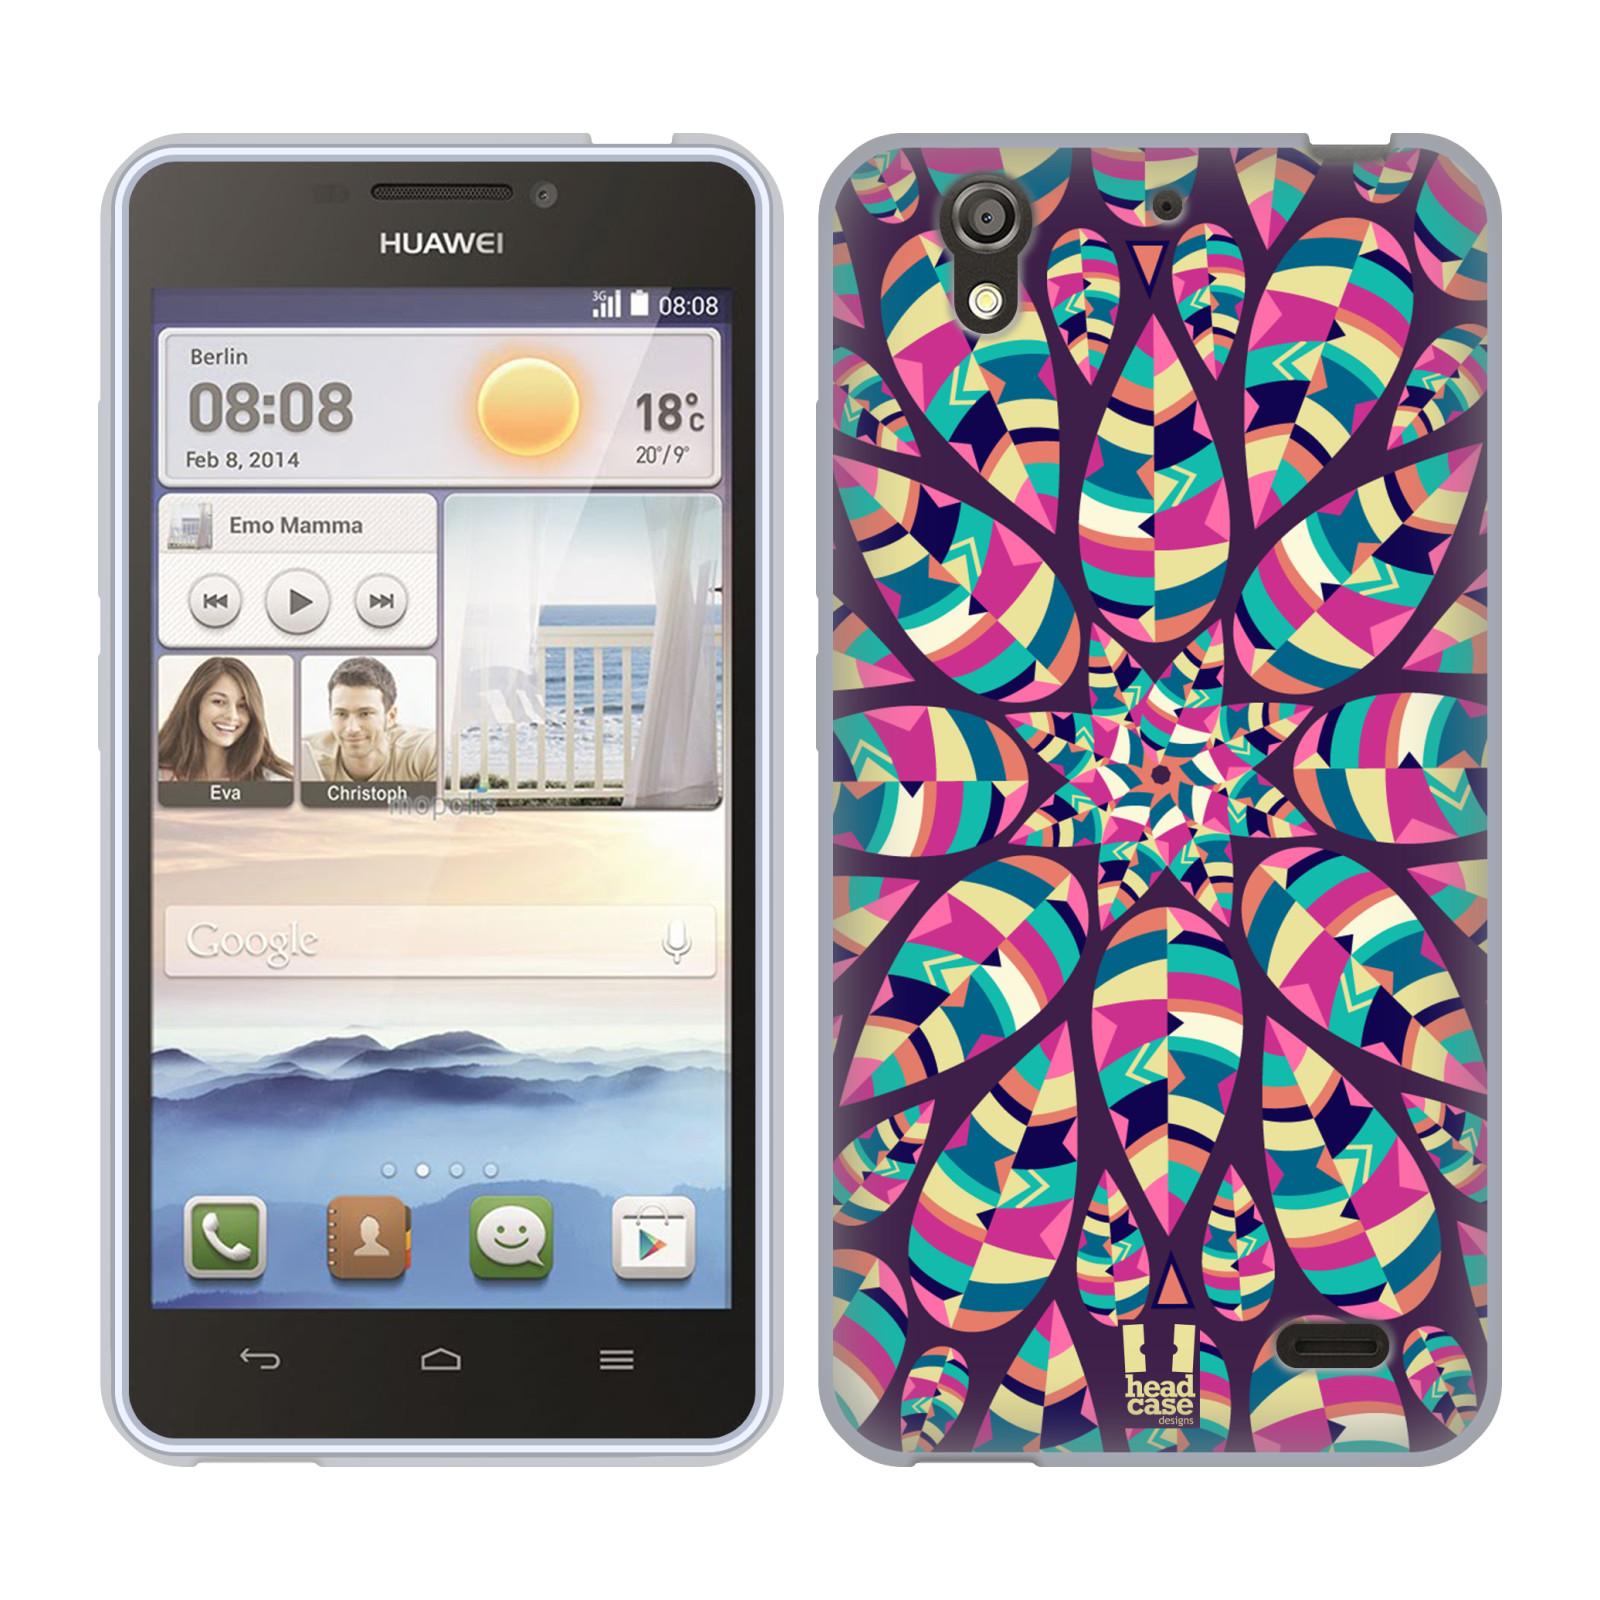 Silikonové pouzdro na mobil Huawei Ascend Y530 HEAD CASE Shine (Silikonový kryt či obal na mobilní telefon Huawei Ascend Y530)